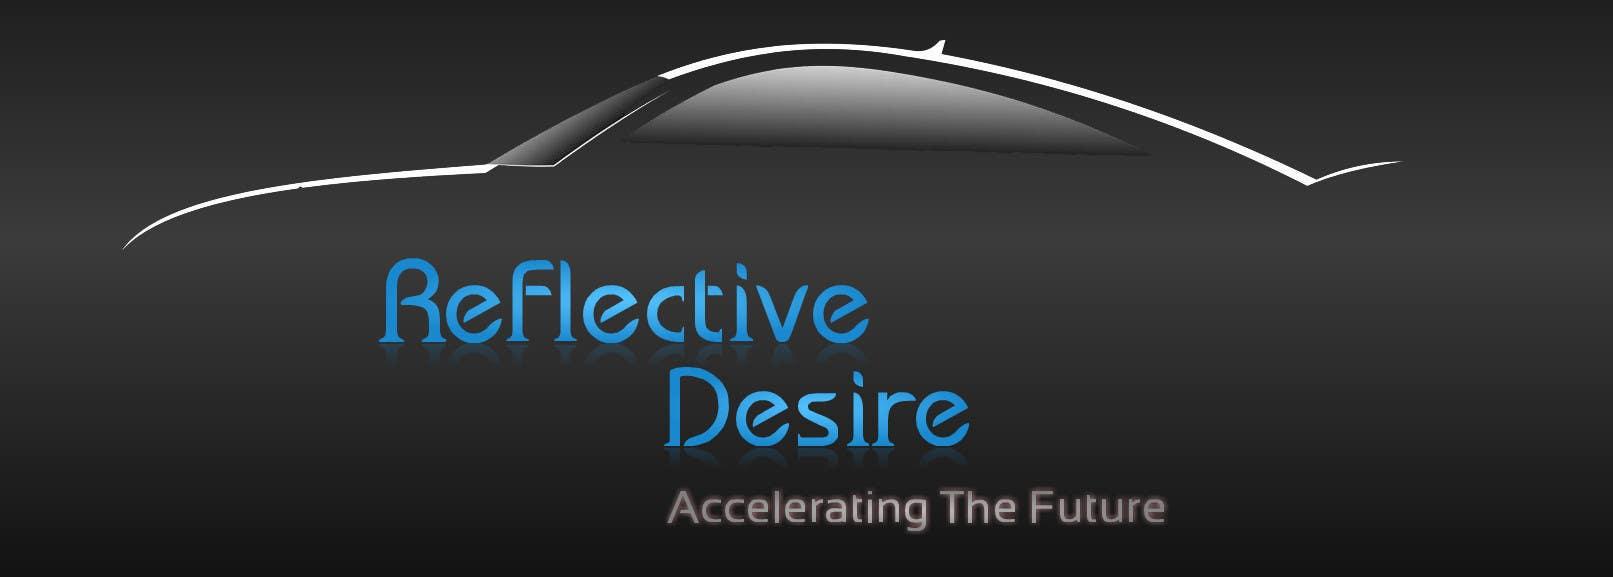 Bài tham dự cuộc thi #                                        60                                      cho                                         Design a Logo for Reflective Desire